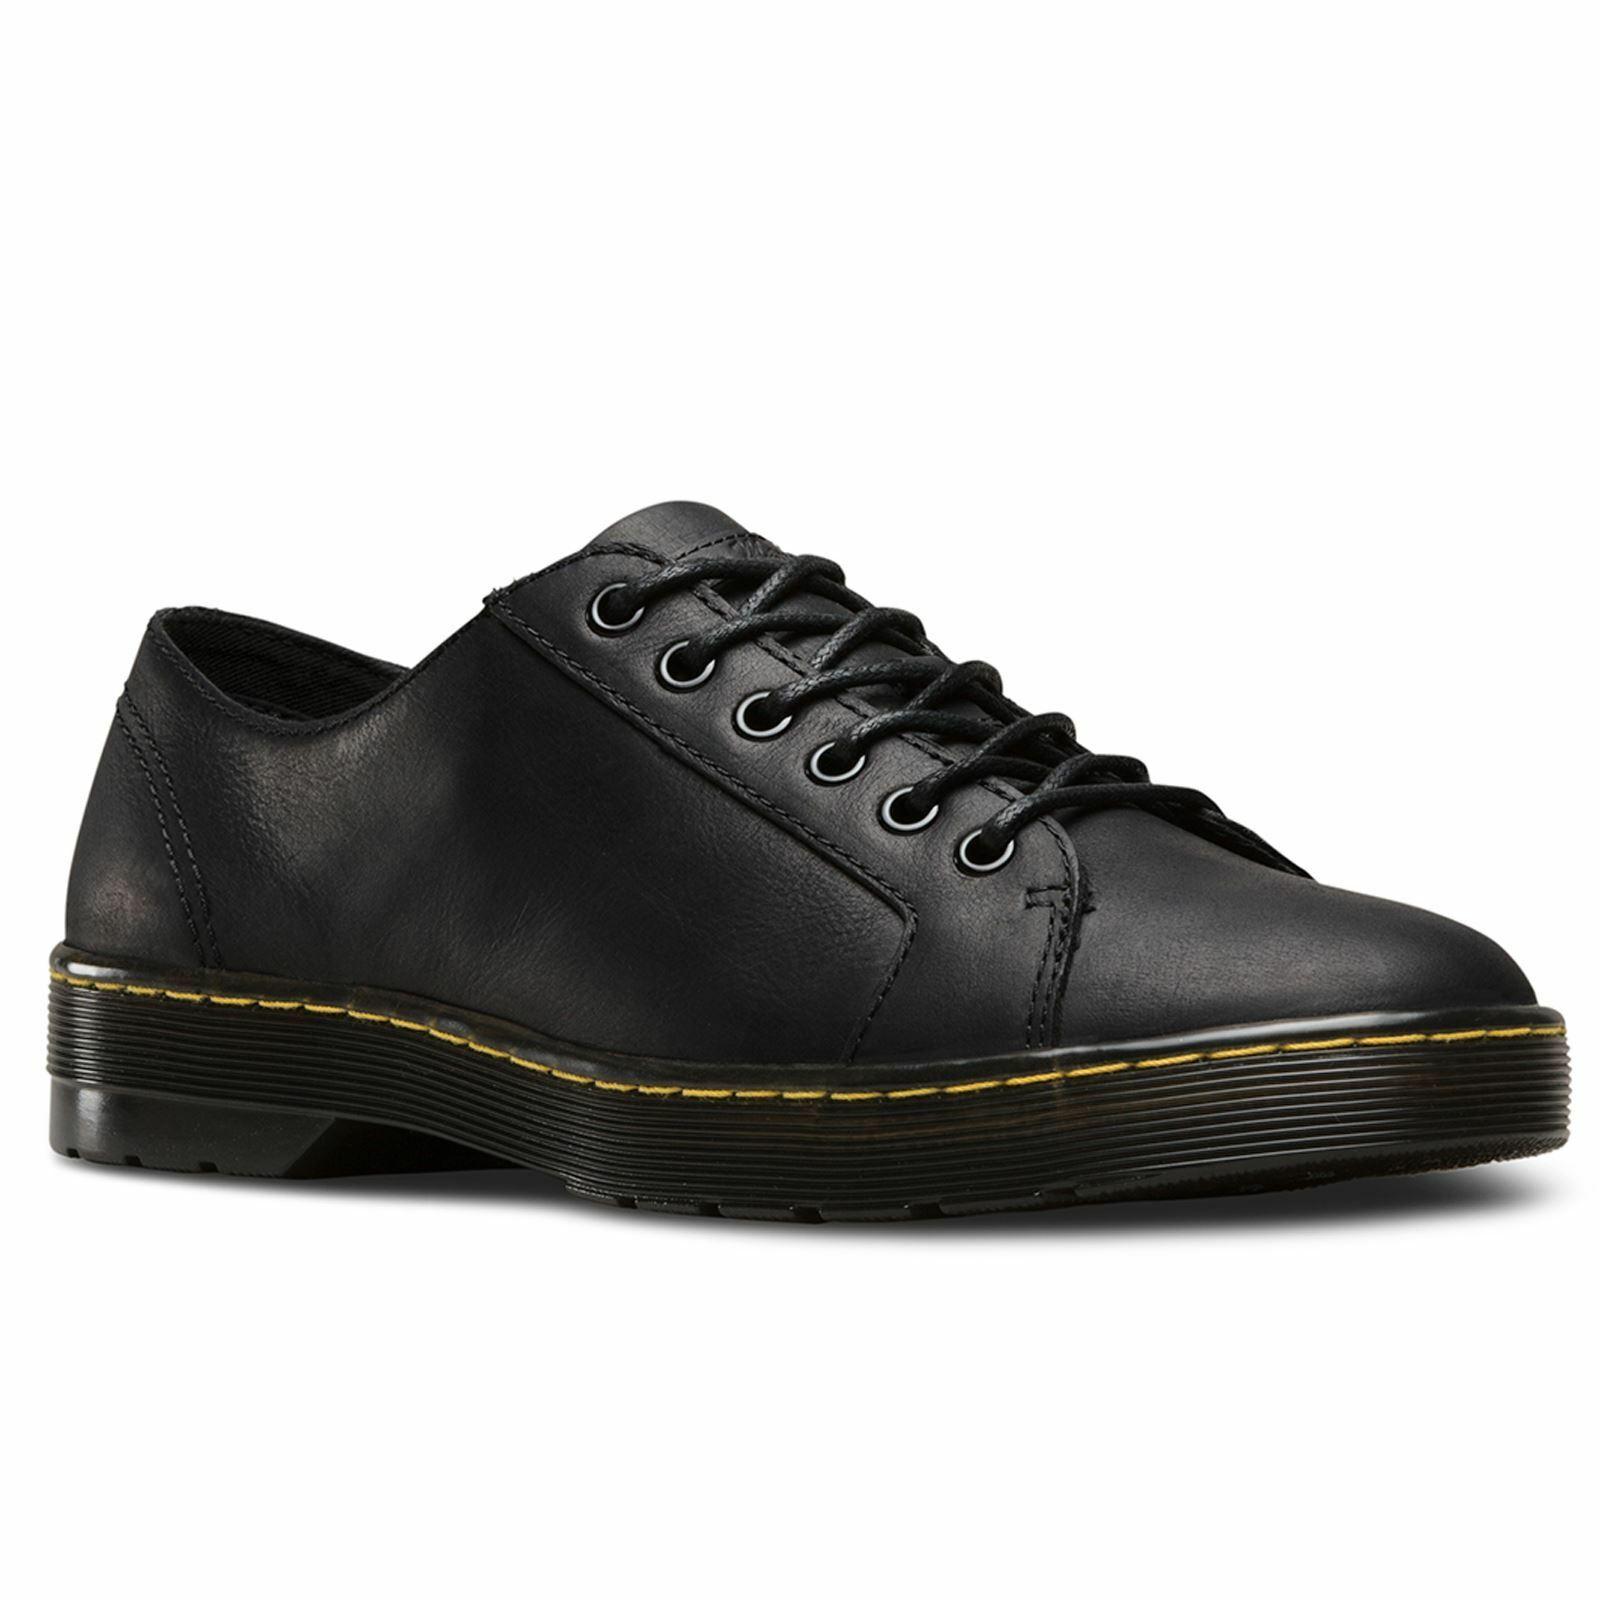 Dr.Martens Wilbur Black Mens Leather Derby Shoes